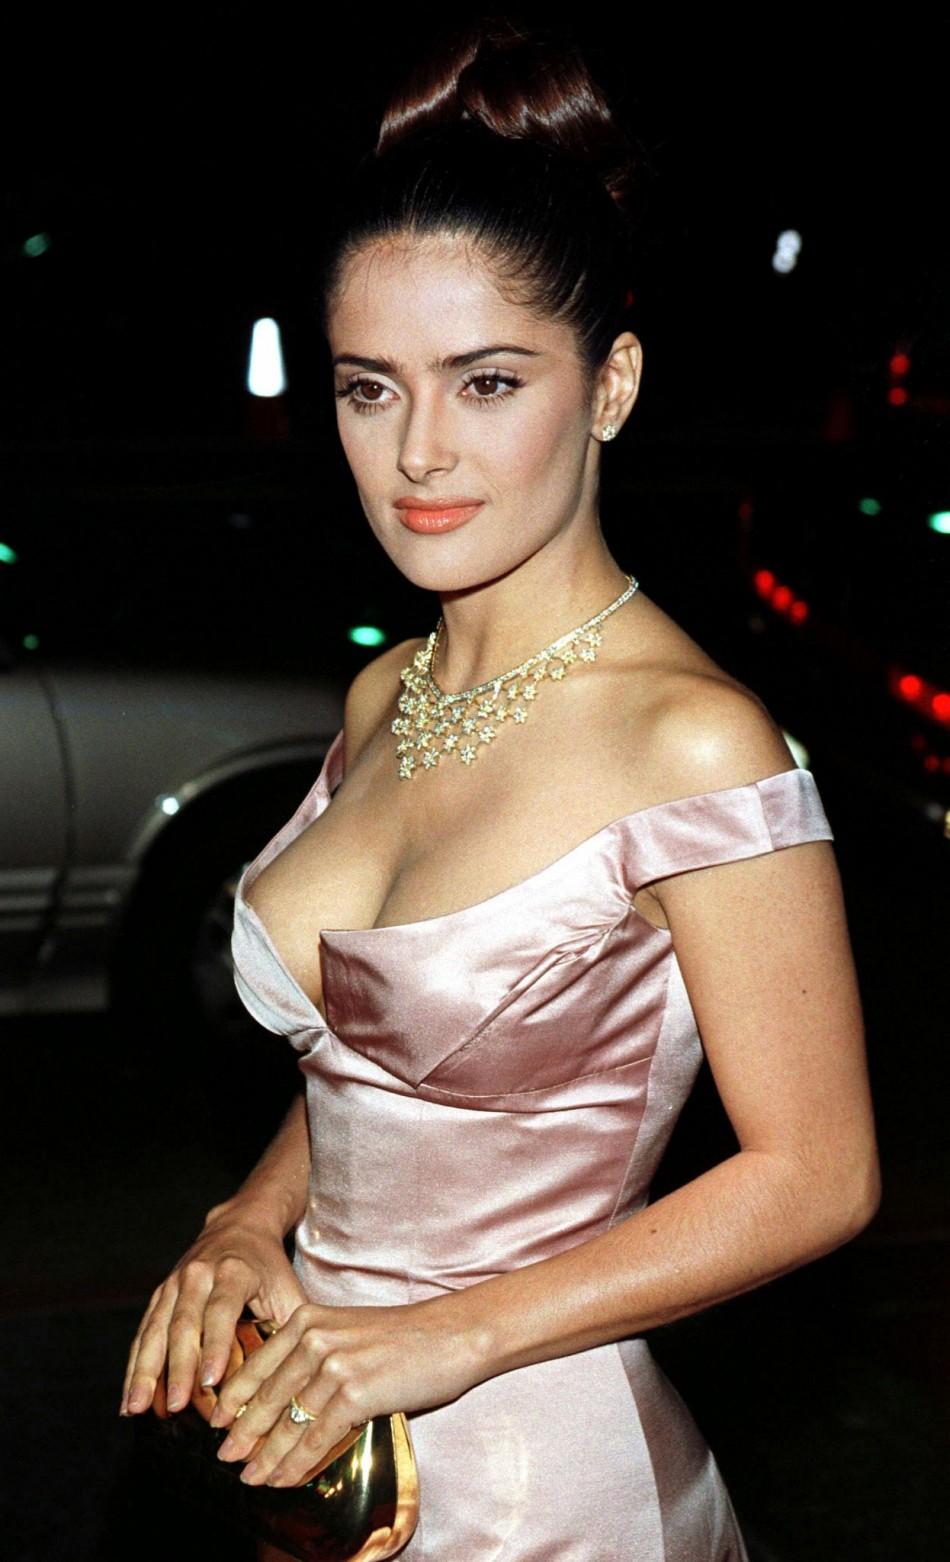 fabio tonazzi latina actresses - photo#34